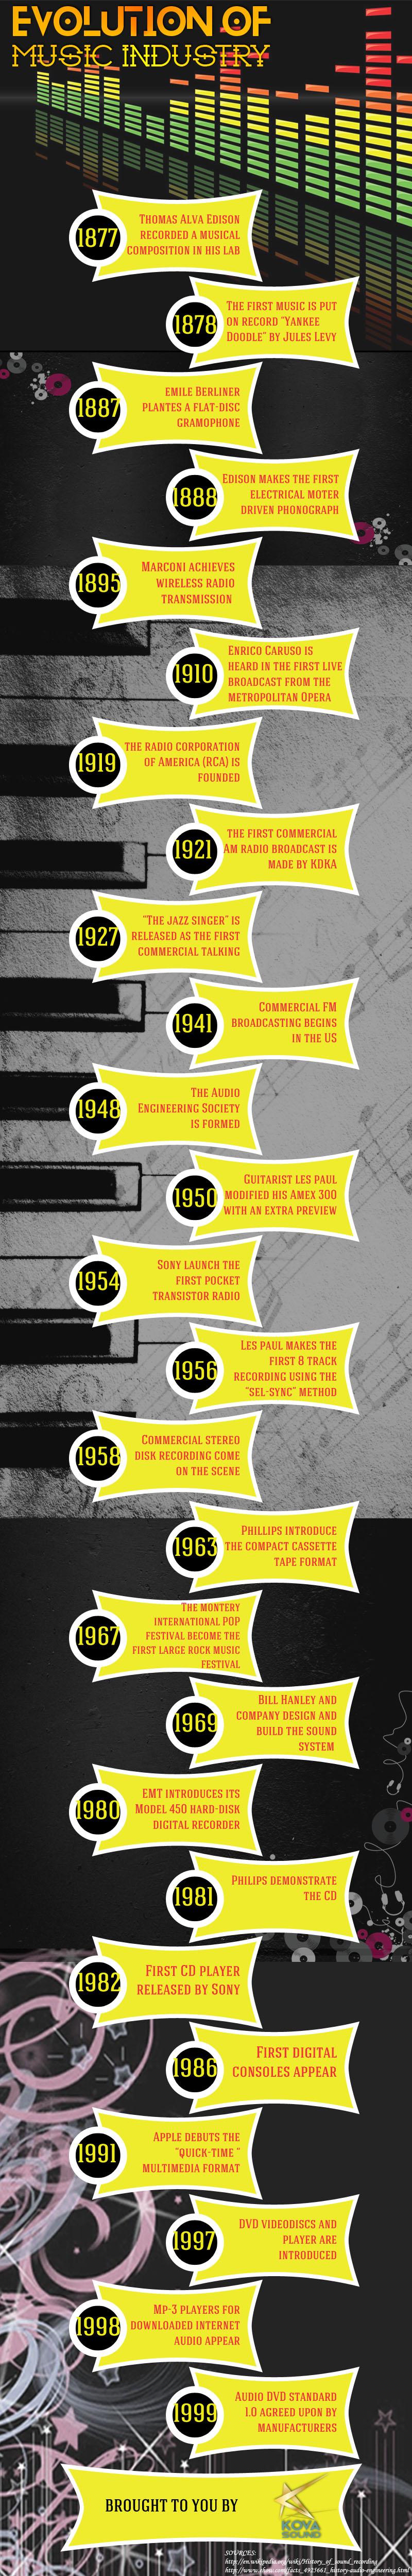 Evolution of Music Industry